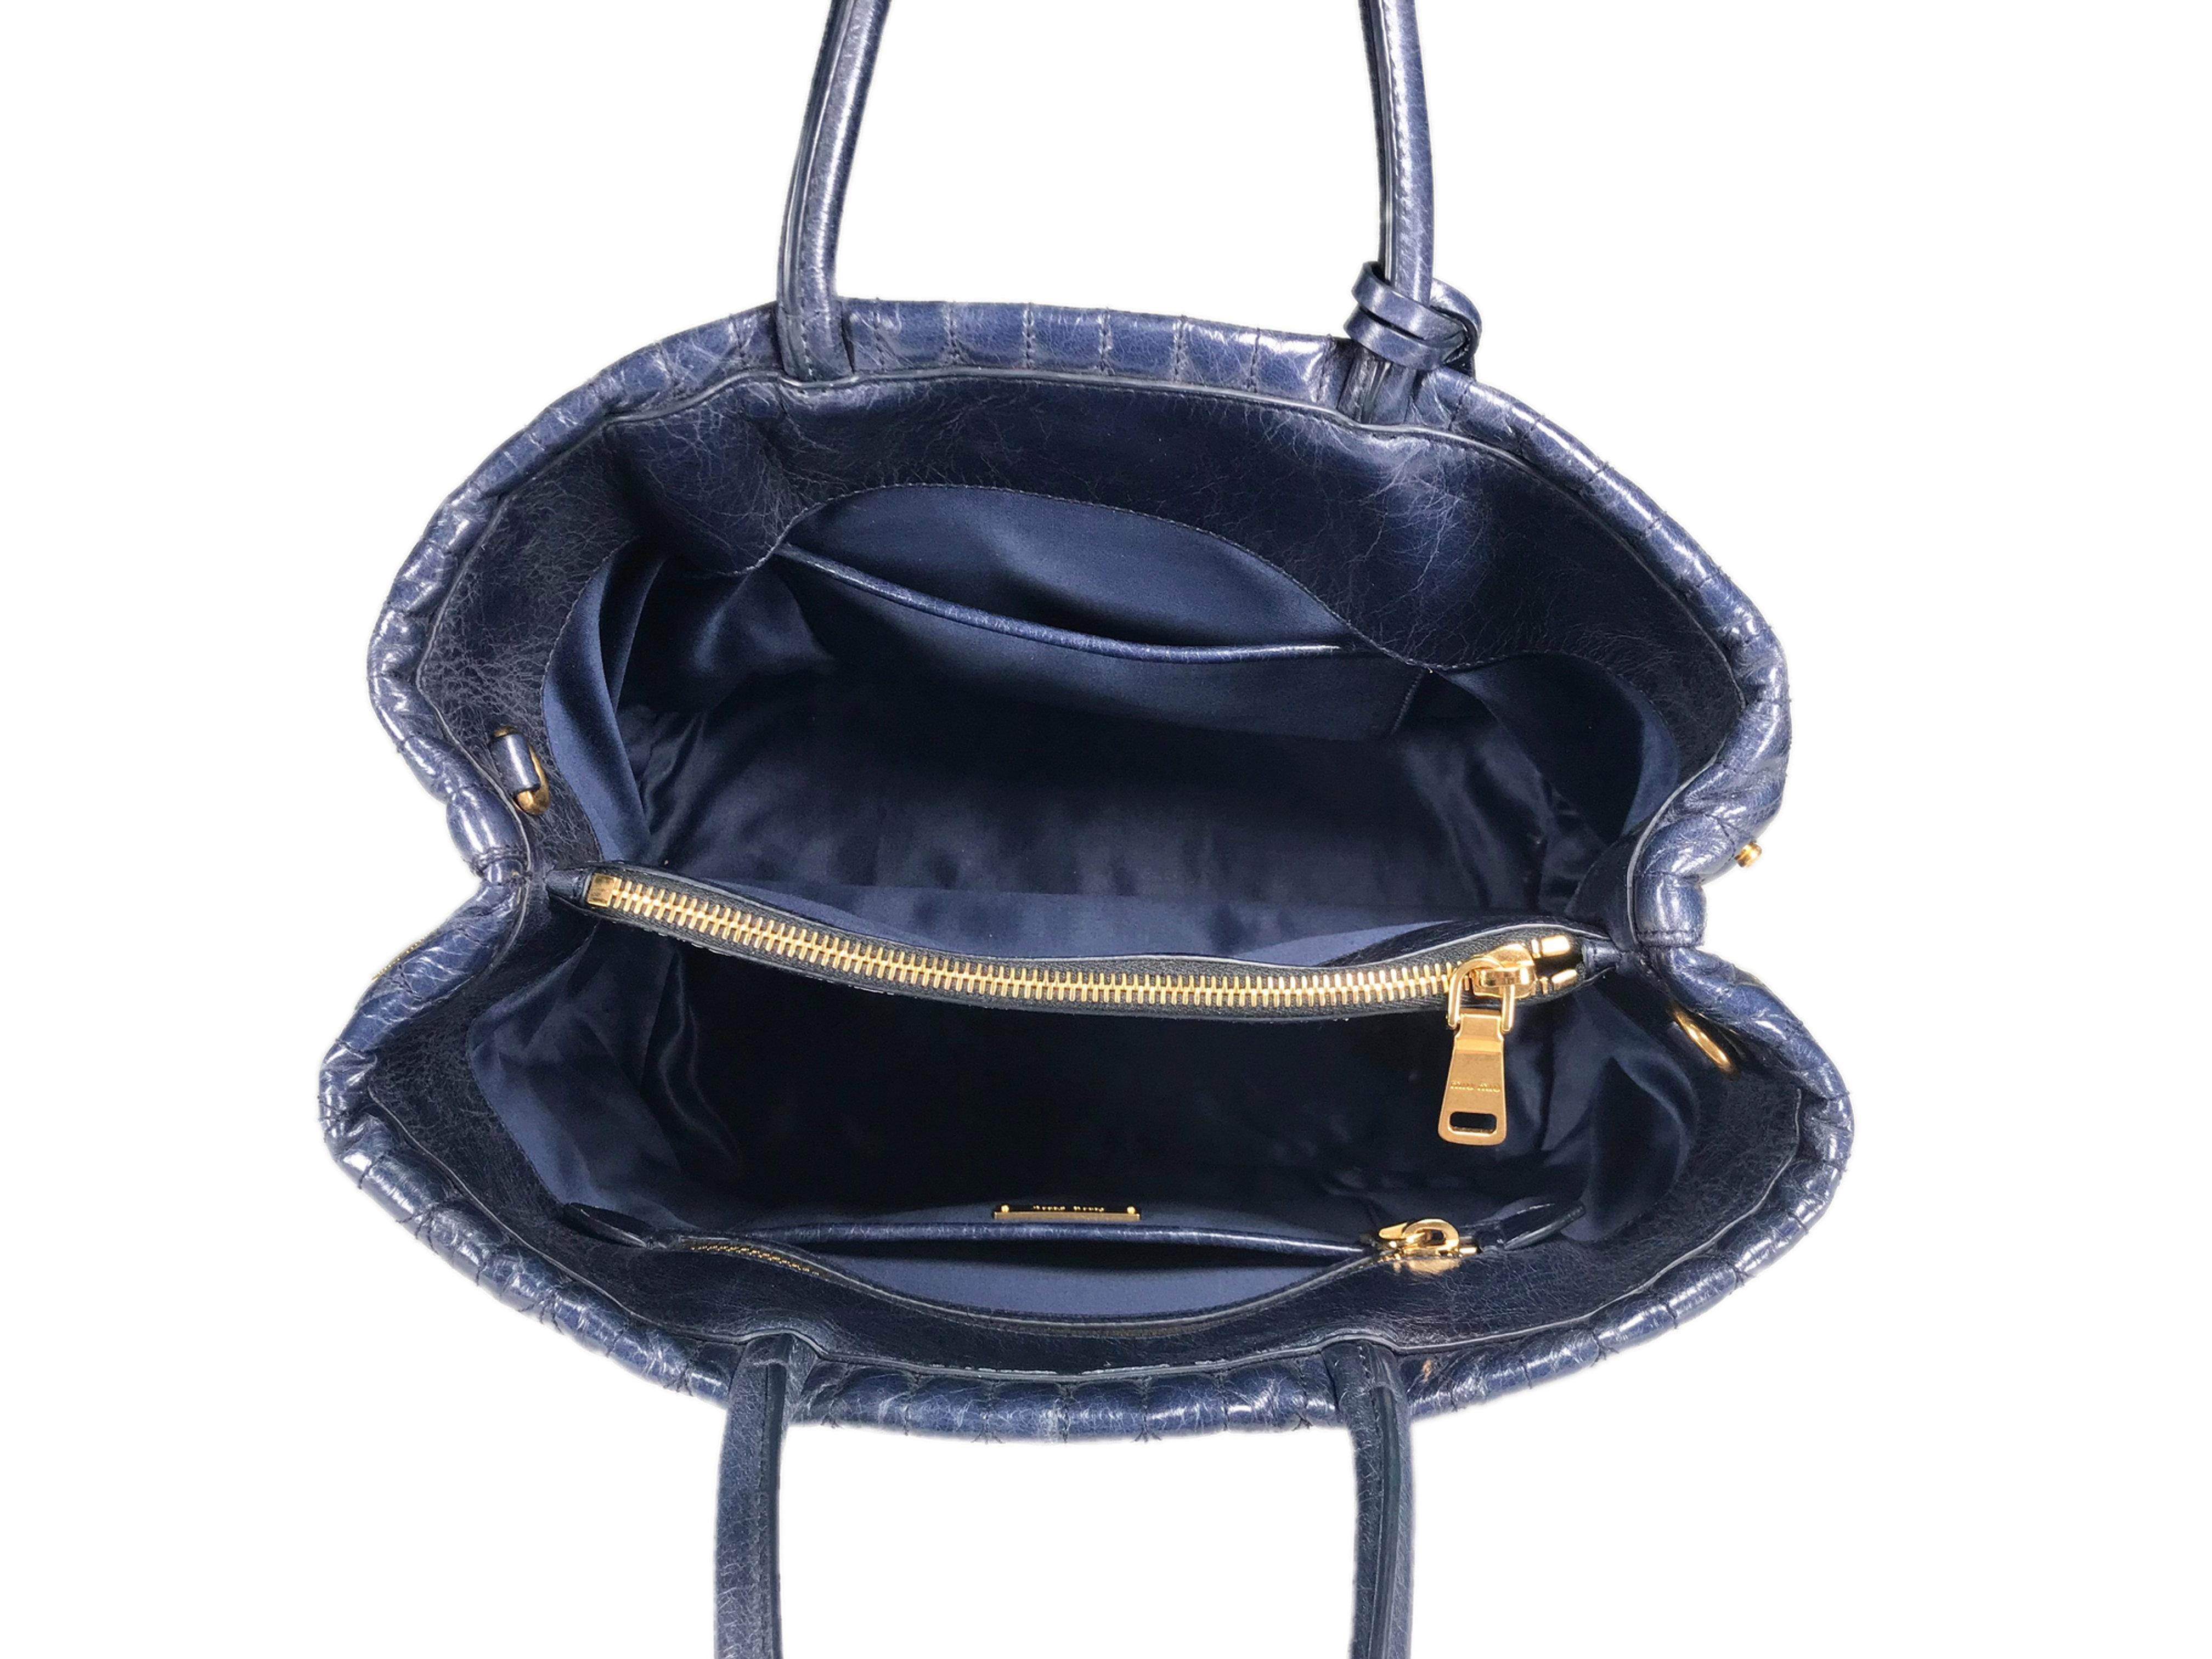 MIU MIU Vitello Shine Trapu Bluette Leather Top Handle Bag e7e2c2520070f